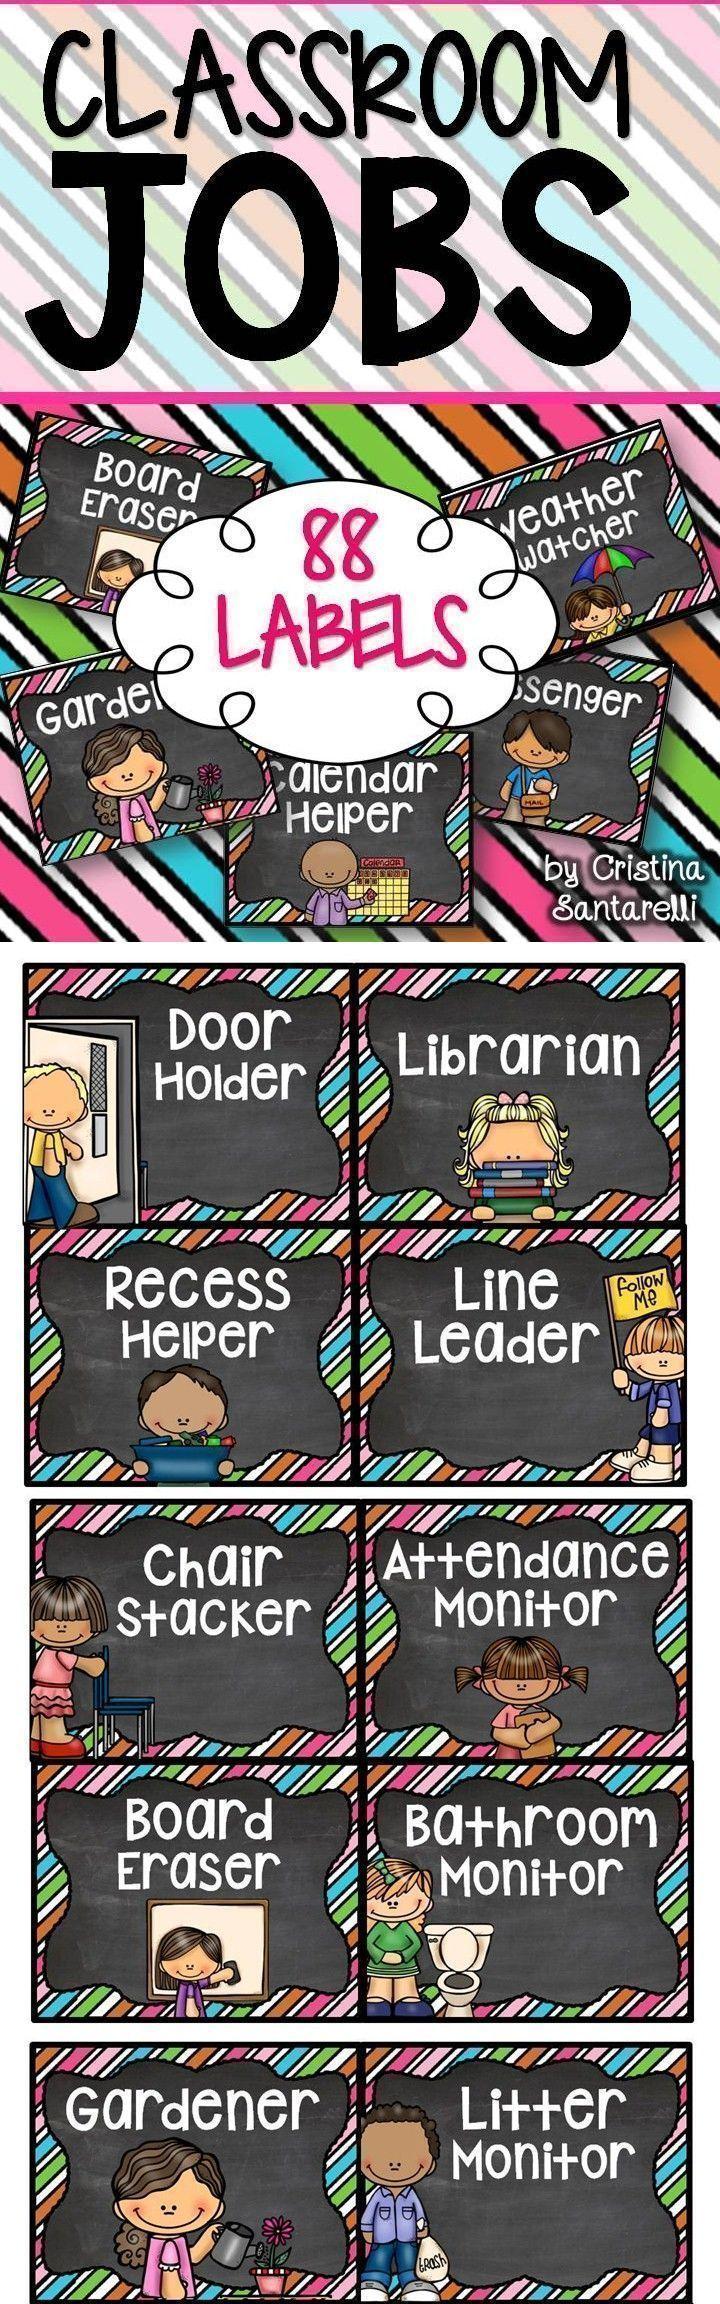 Classroom Jobs!